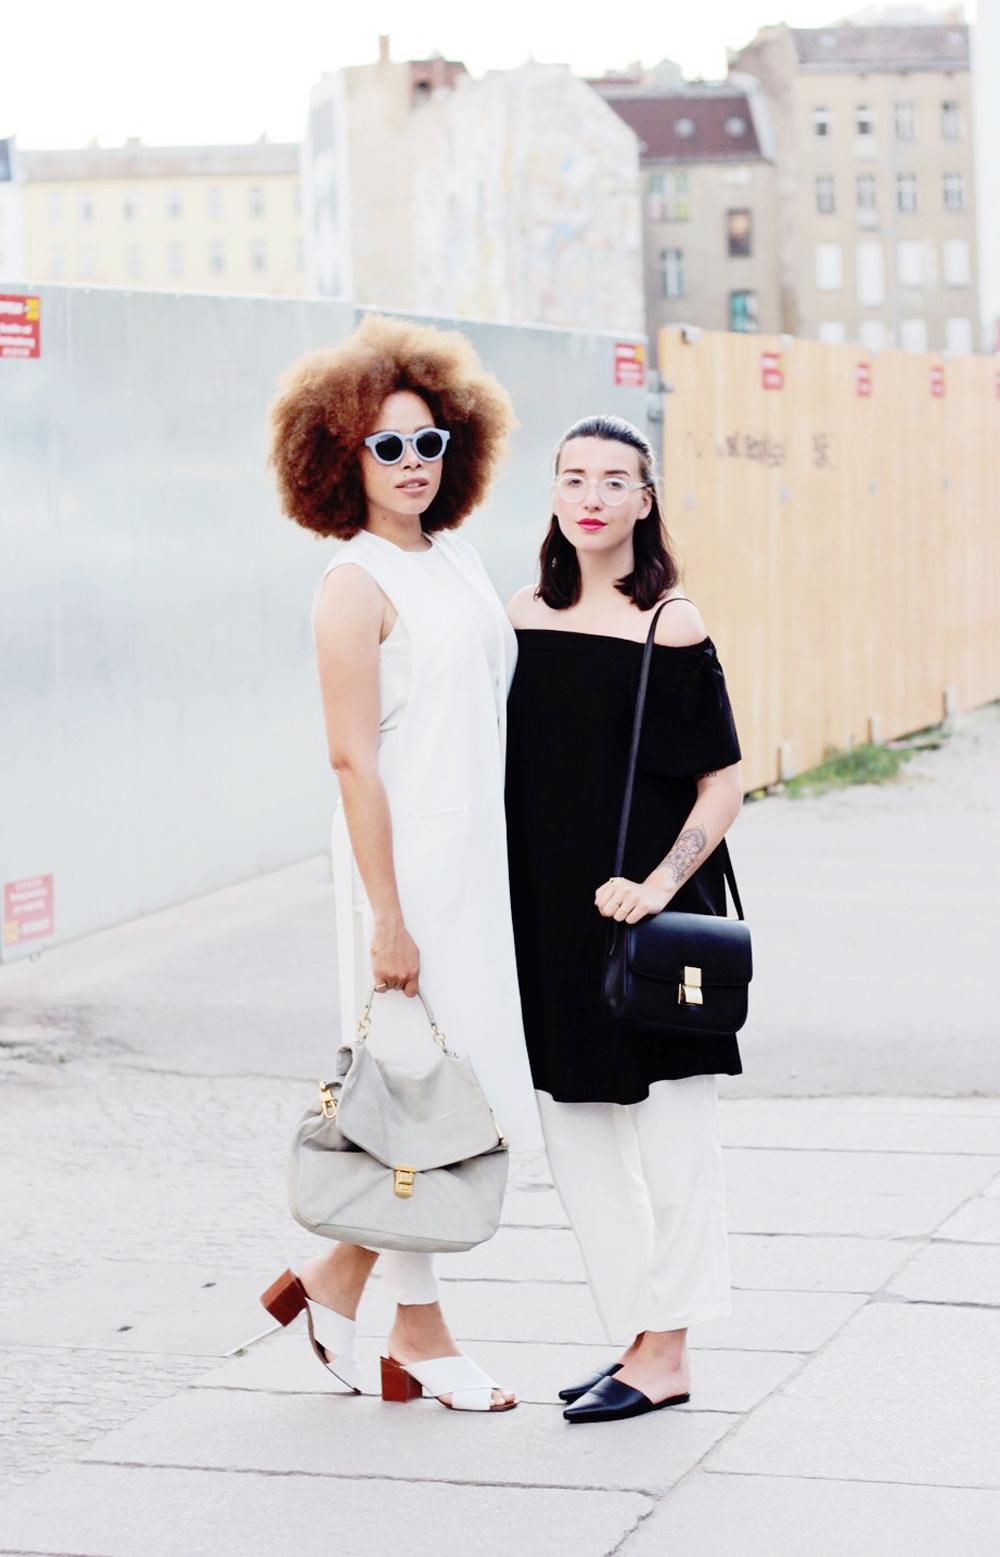 fatimayarie-basicapparel-fashionblogger-blackandwhite-minimalistic-twinning-img_9014